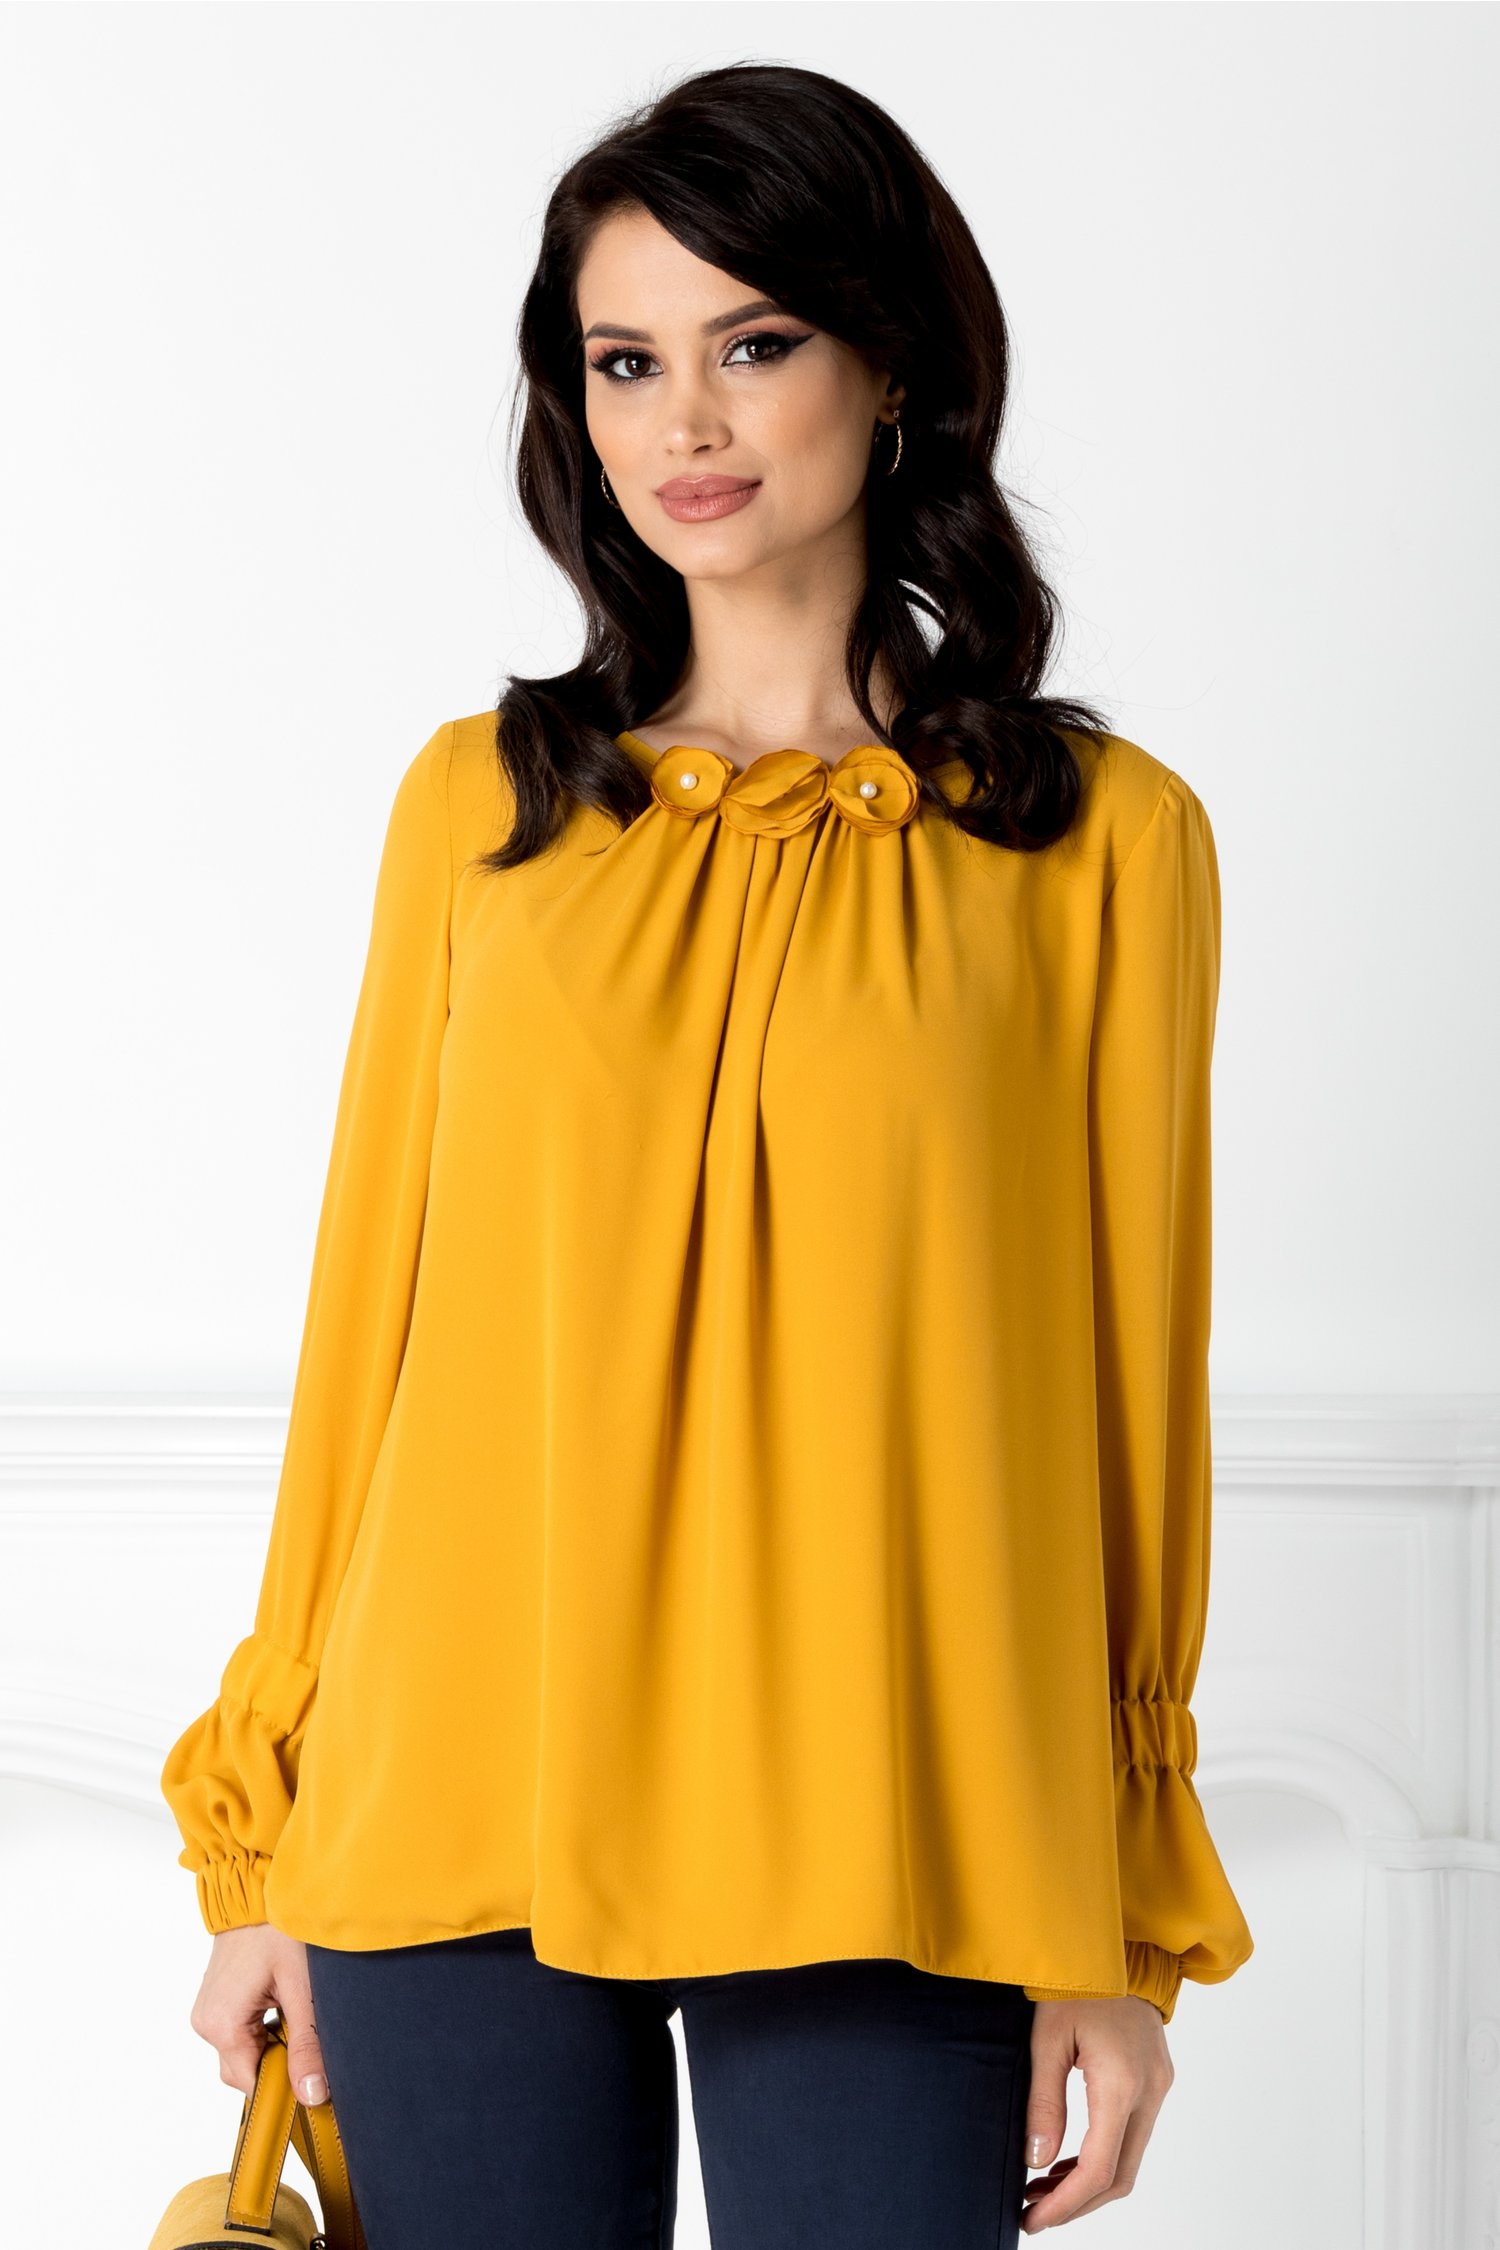 Bluza LaDonna vaporoasa galben mustar cu flori 3D la guler